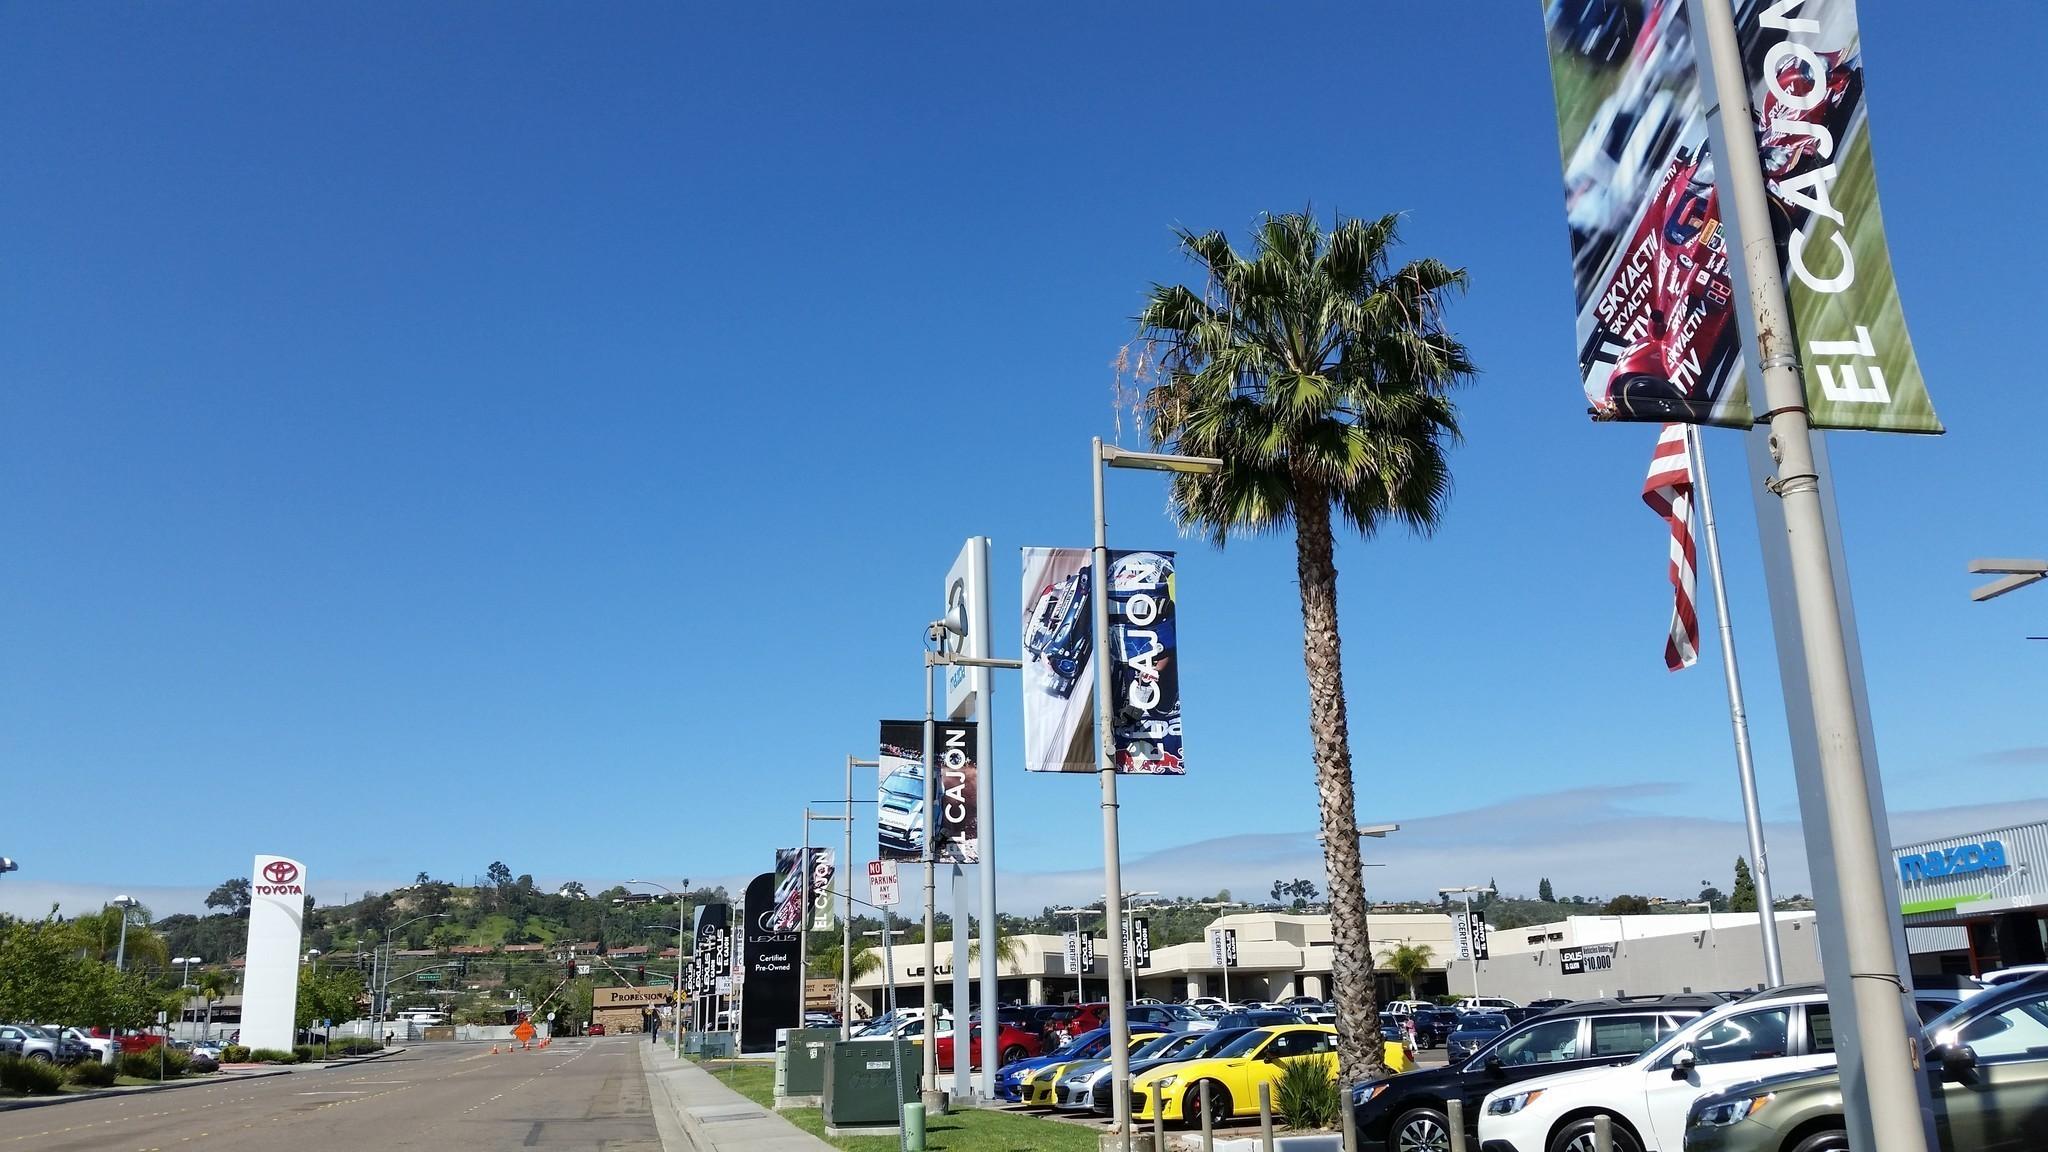 City Of El Cajon >> 12th new car dealership coming to El Cajon - The San Diego ...